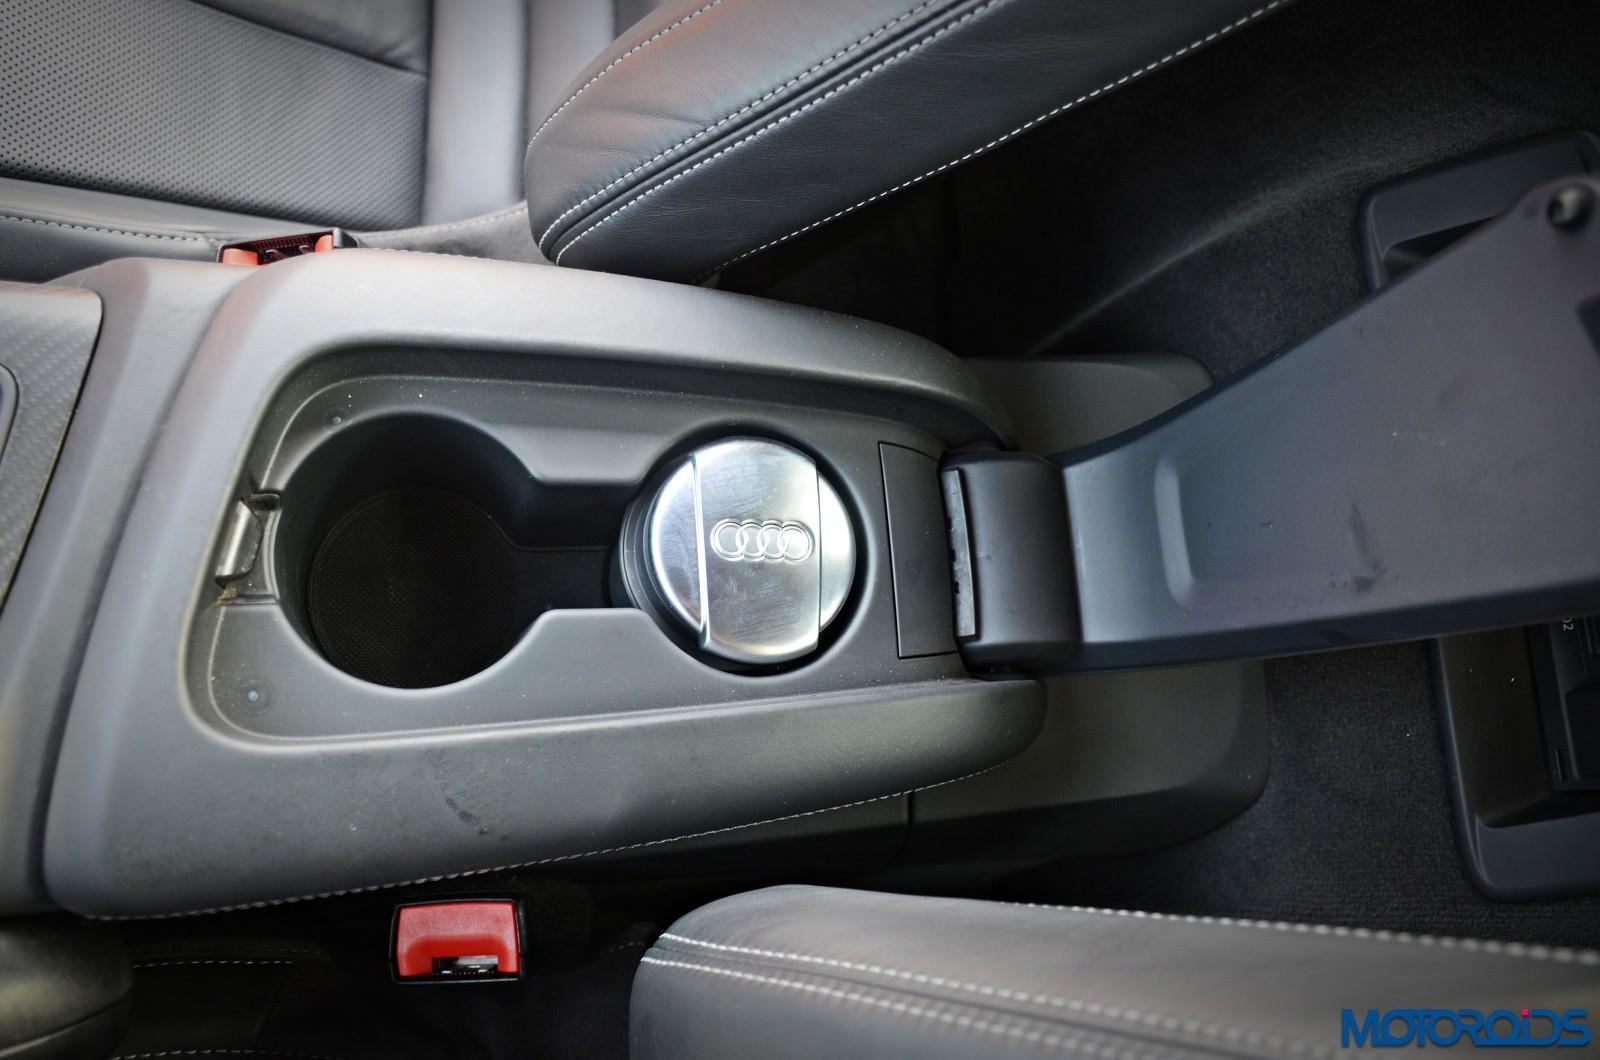 New-Audi-R8-V10-Plus-front-armrest-1